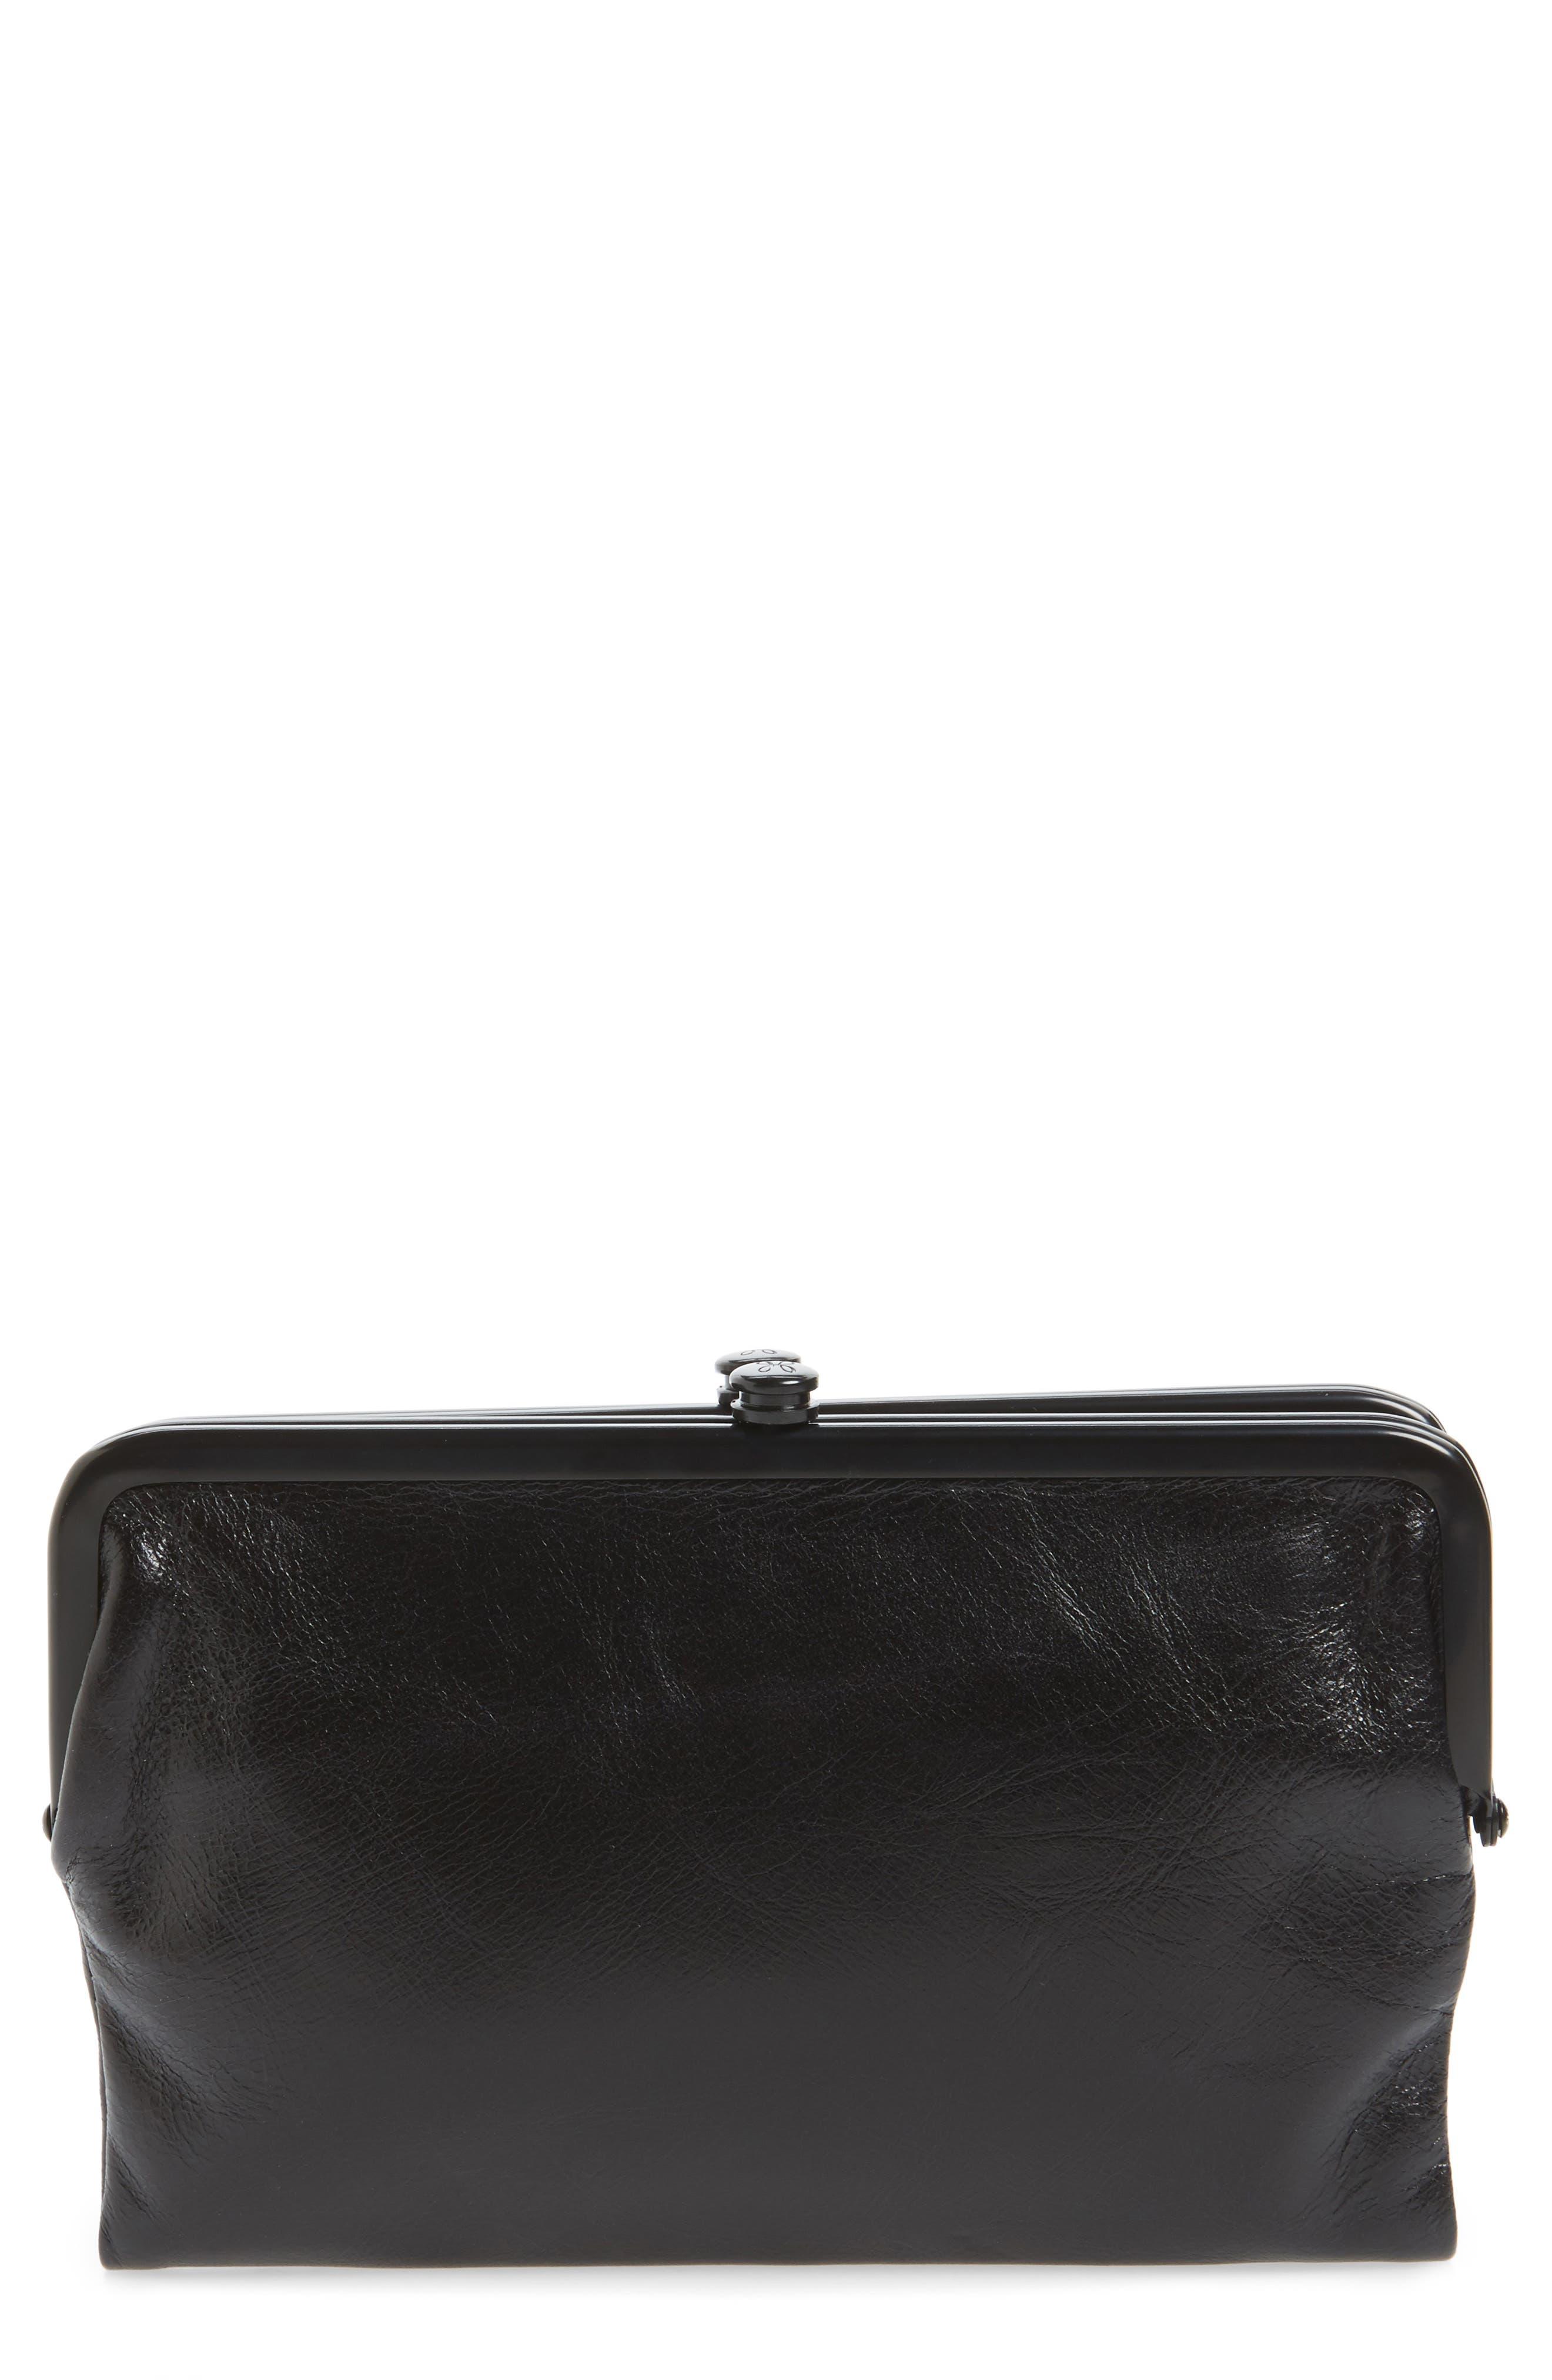 Glory Wallet,                         Main,                         color, BLACK